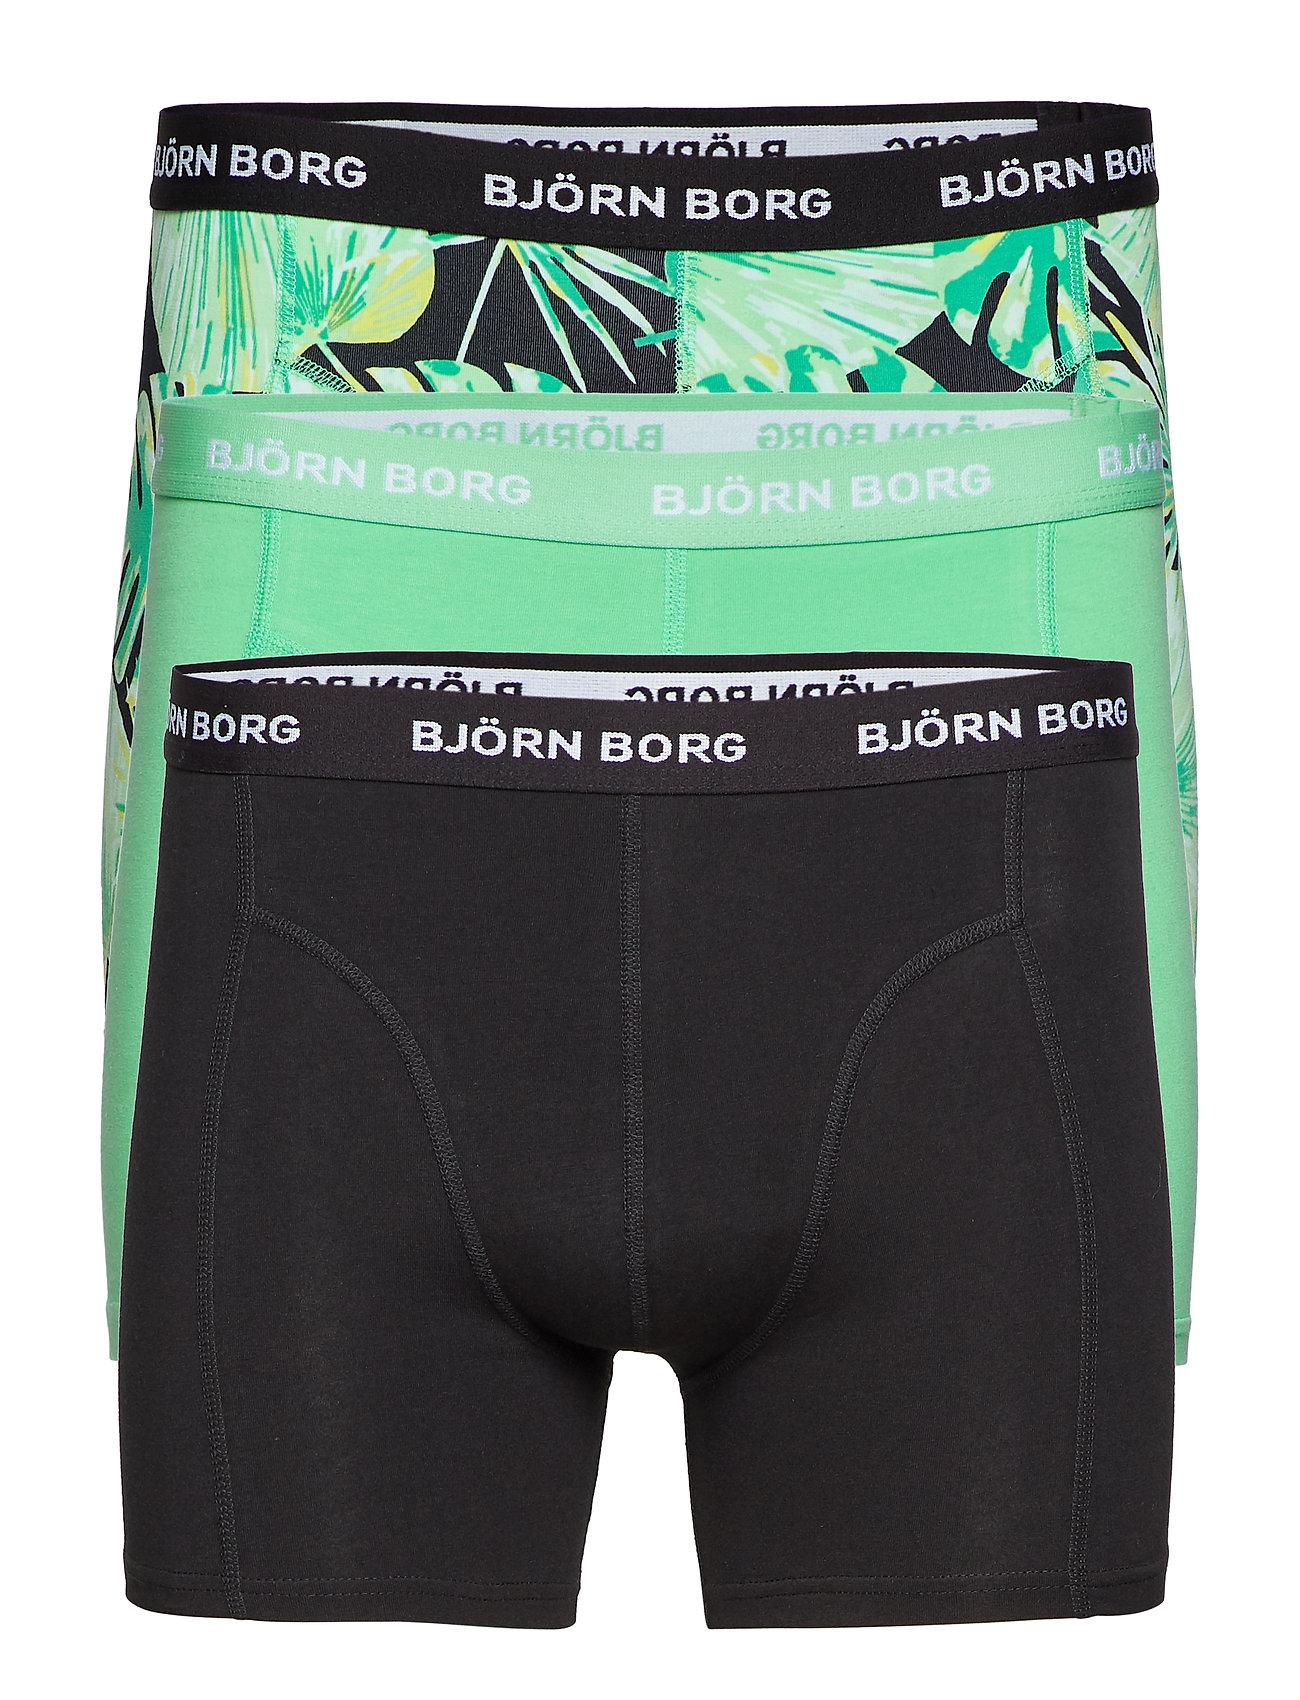 d1d9100e Shorts Bb La Garden 3p (Black Beauty) (£31.85) - Björn Borg ...